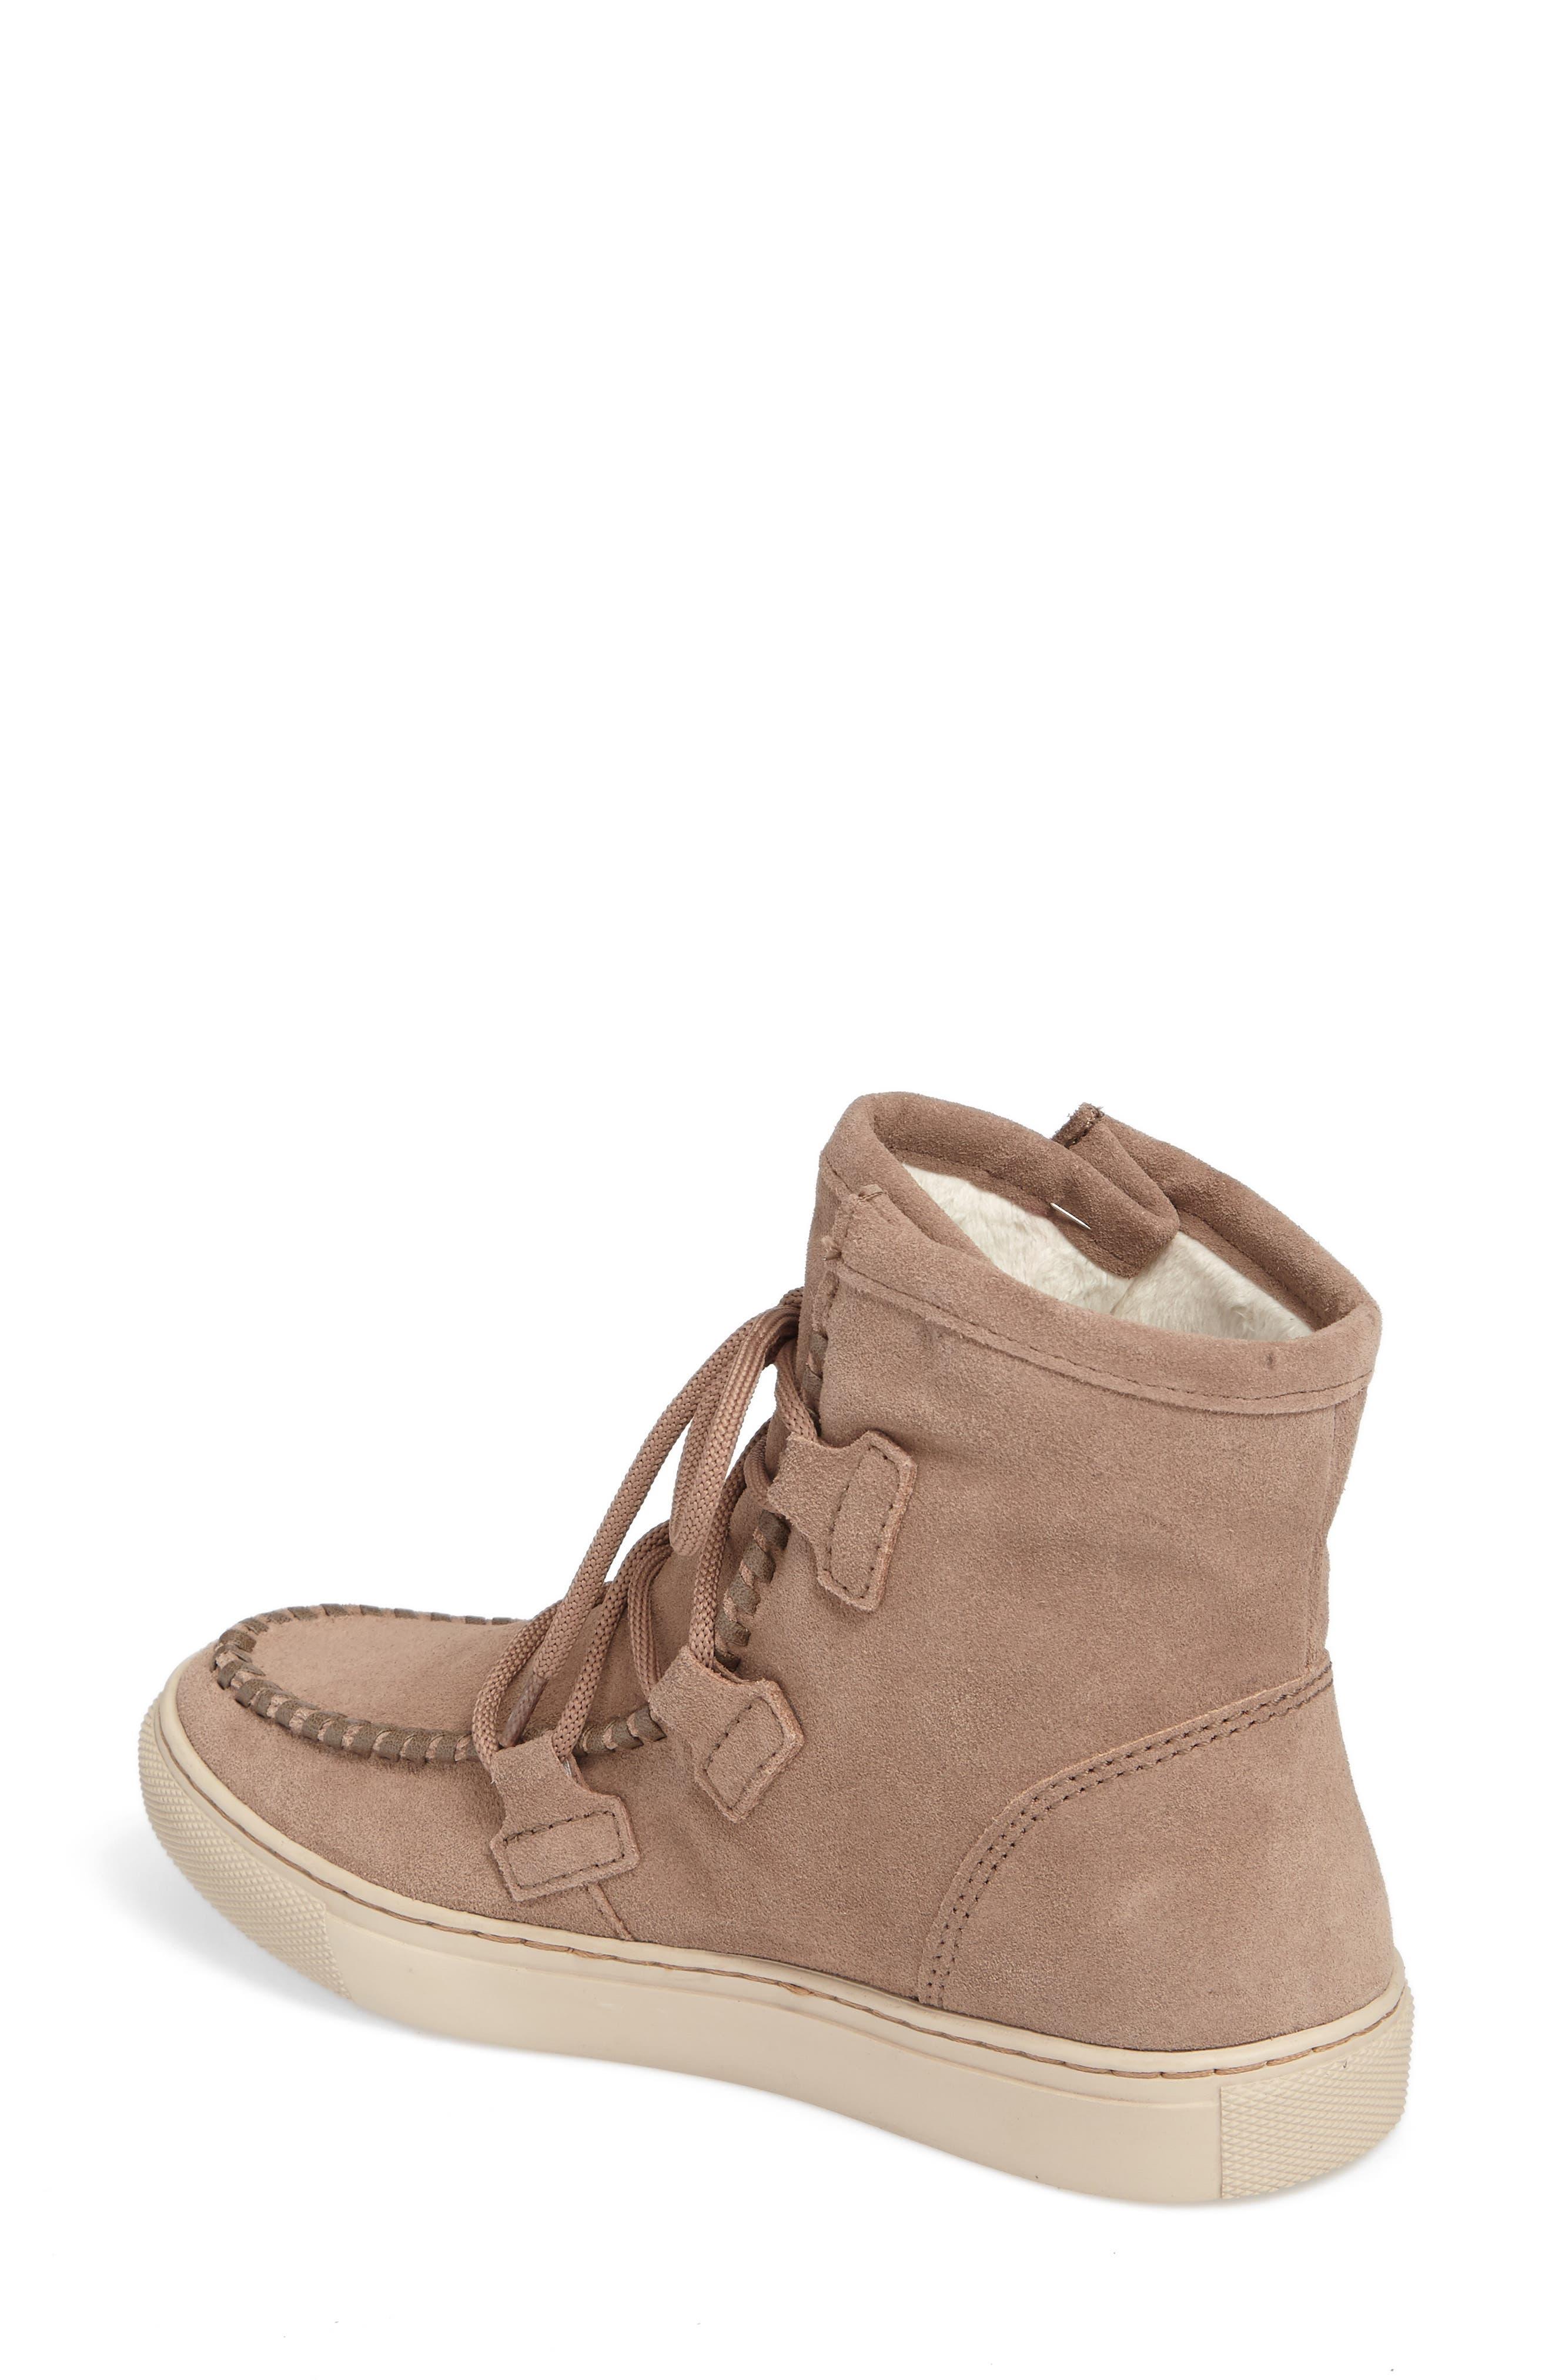 Fabiola Waterproof High Top Sneaker,                             Alternate thumbnail 2, color,                             Taupe Suede